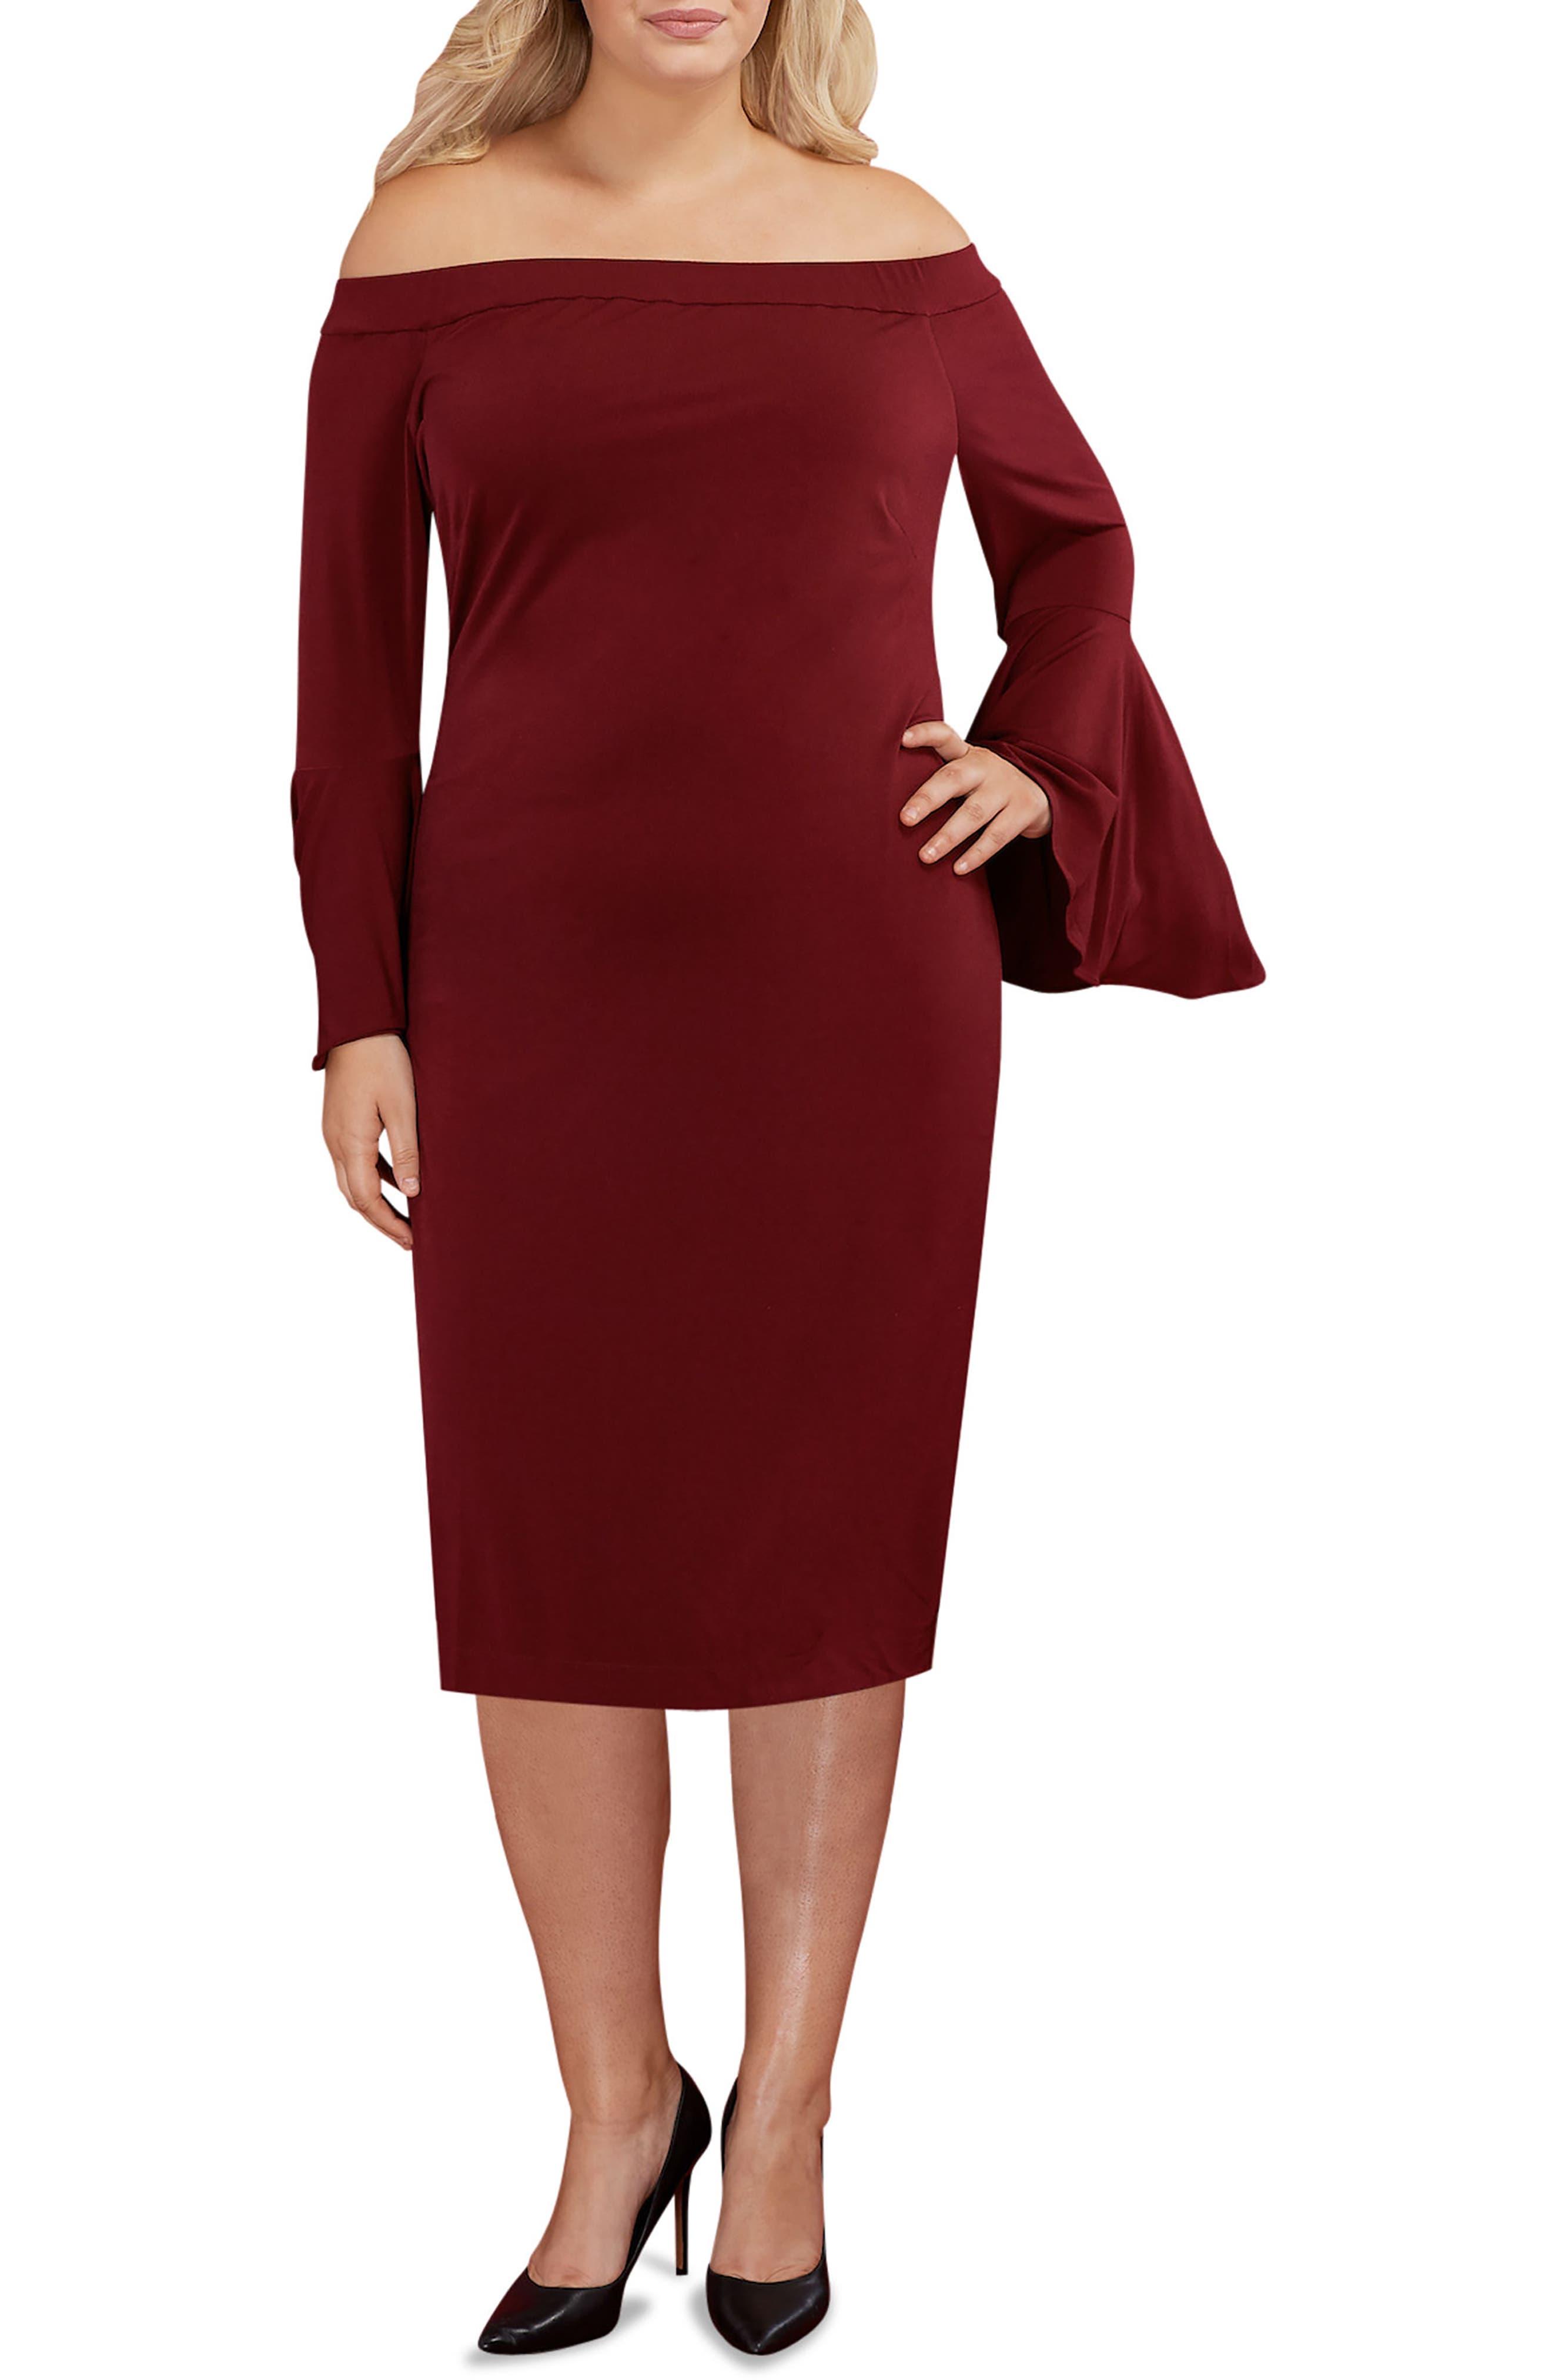 Purple Cocktail Dresses for Weddings